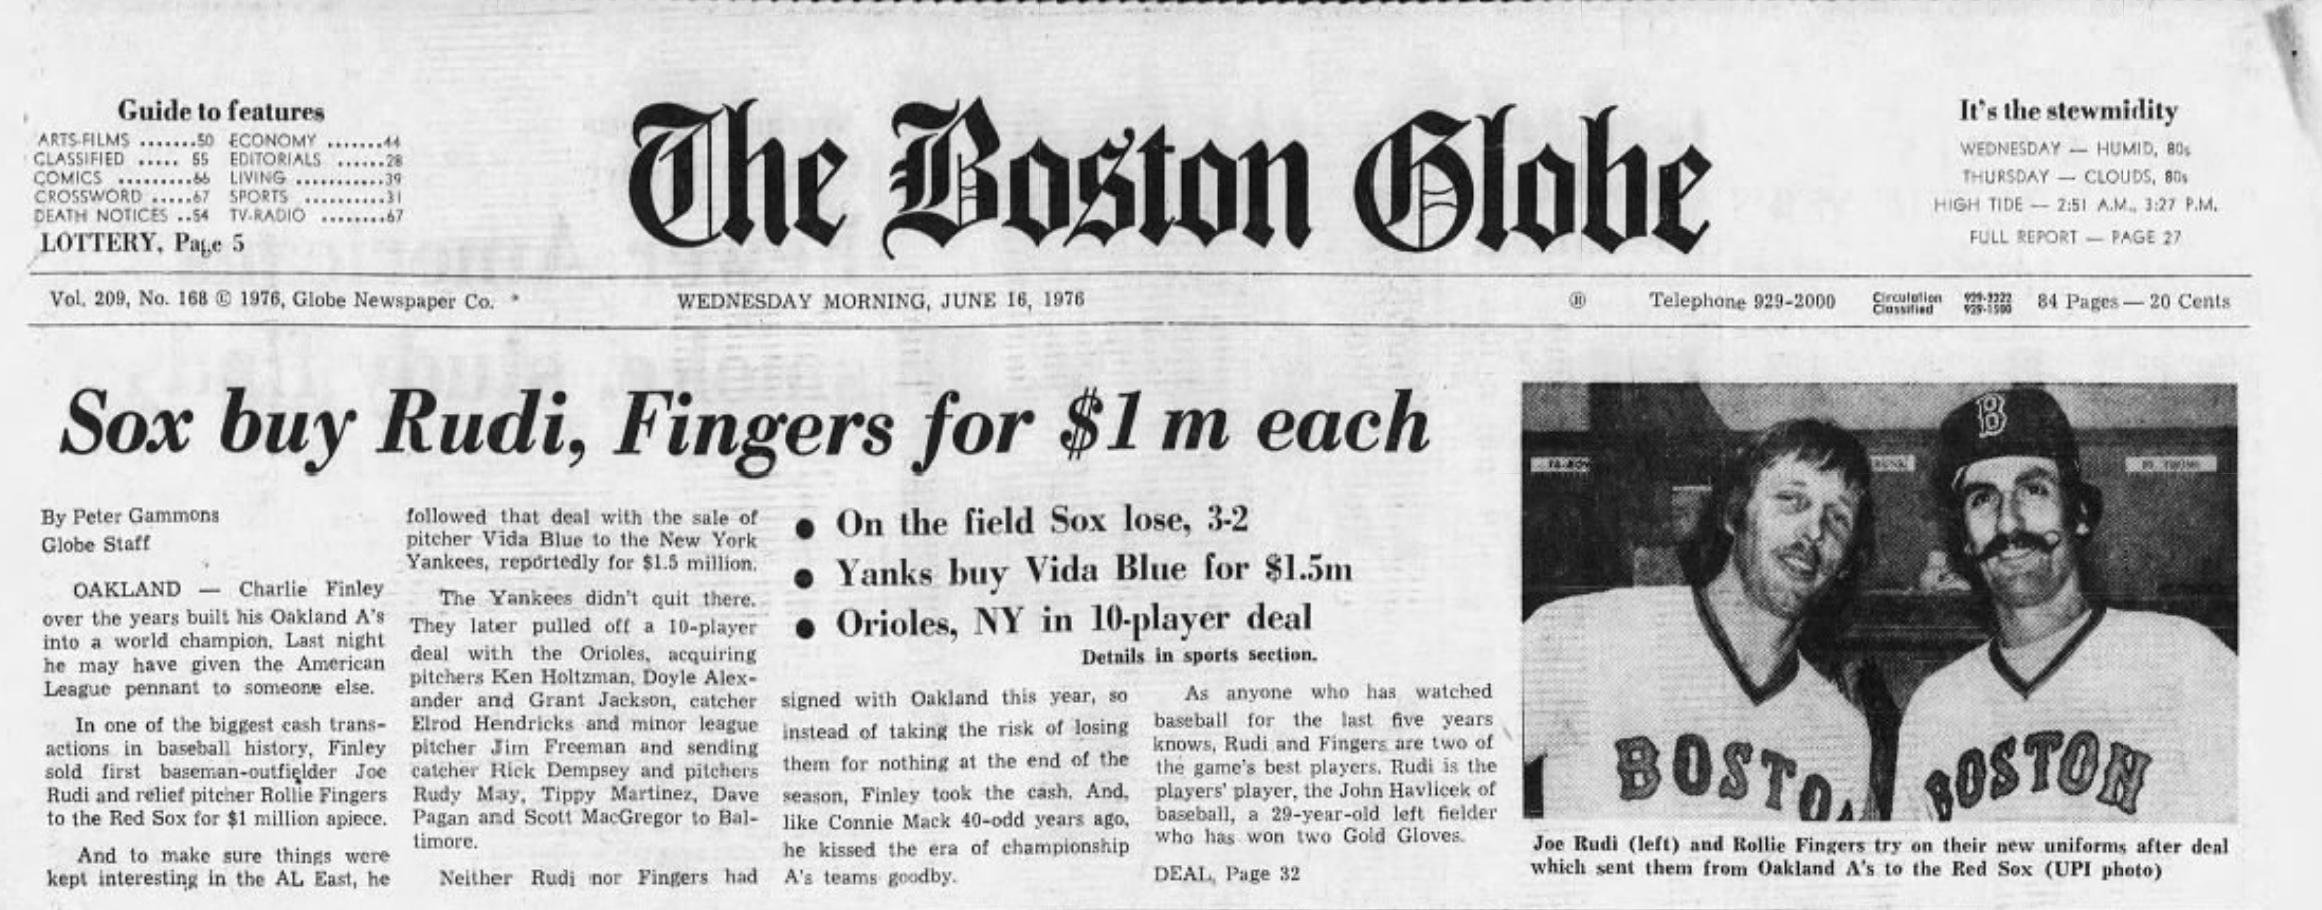 Red Sox Rollie Fingers Joe Rudi